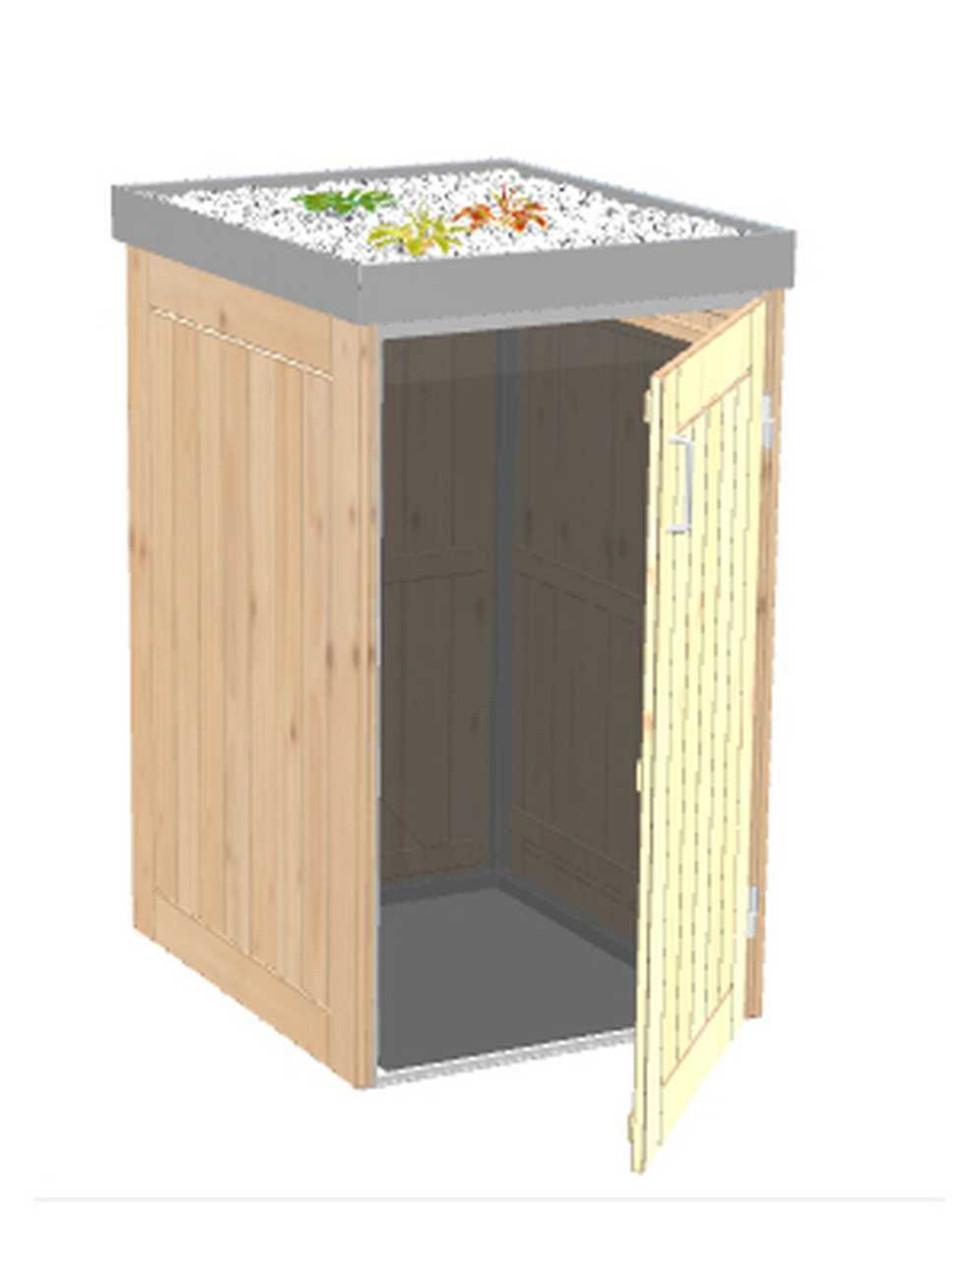 Mülltonnenbox Binto 1-er Nadelholz mit Pflanzschale